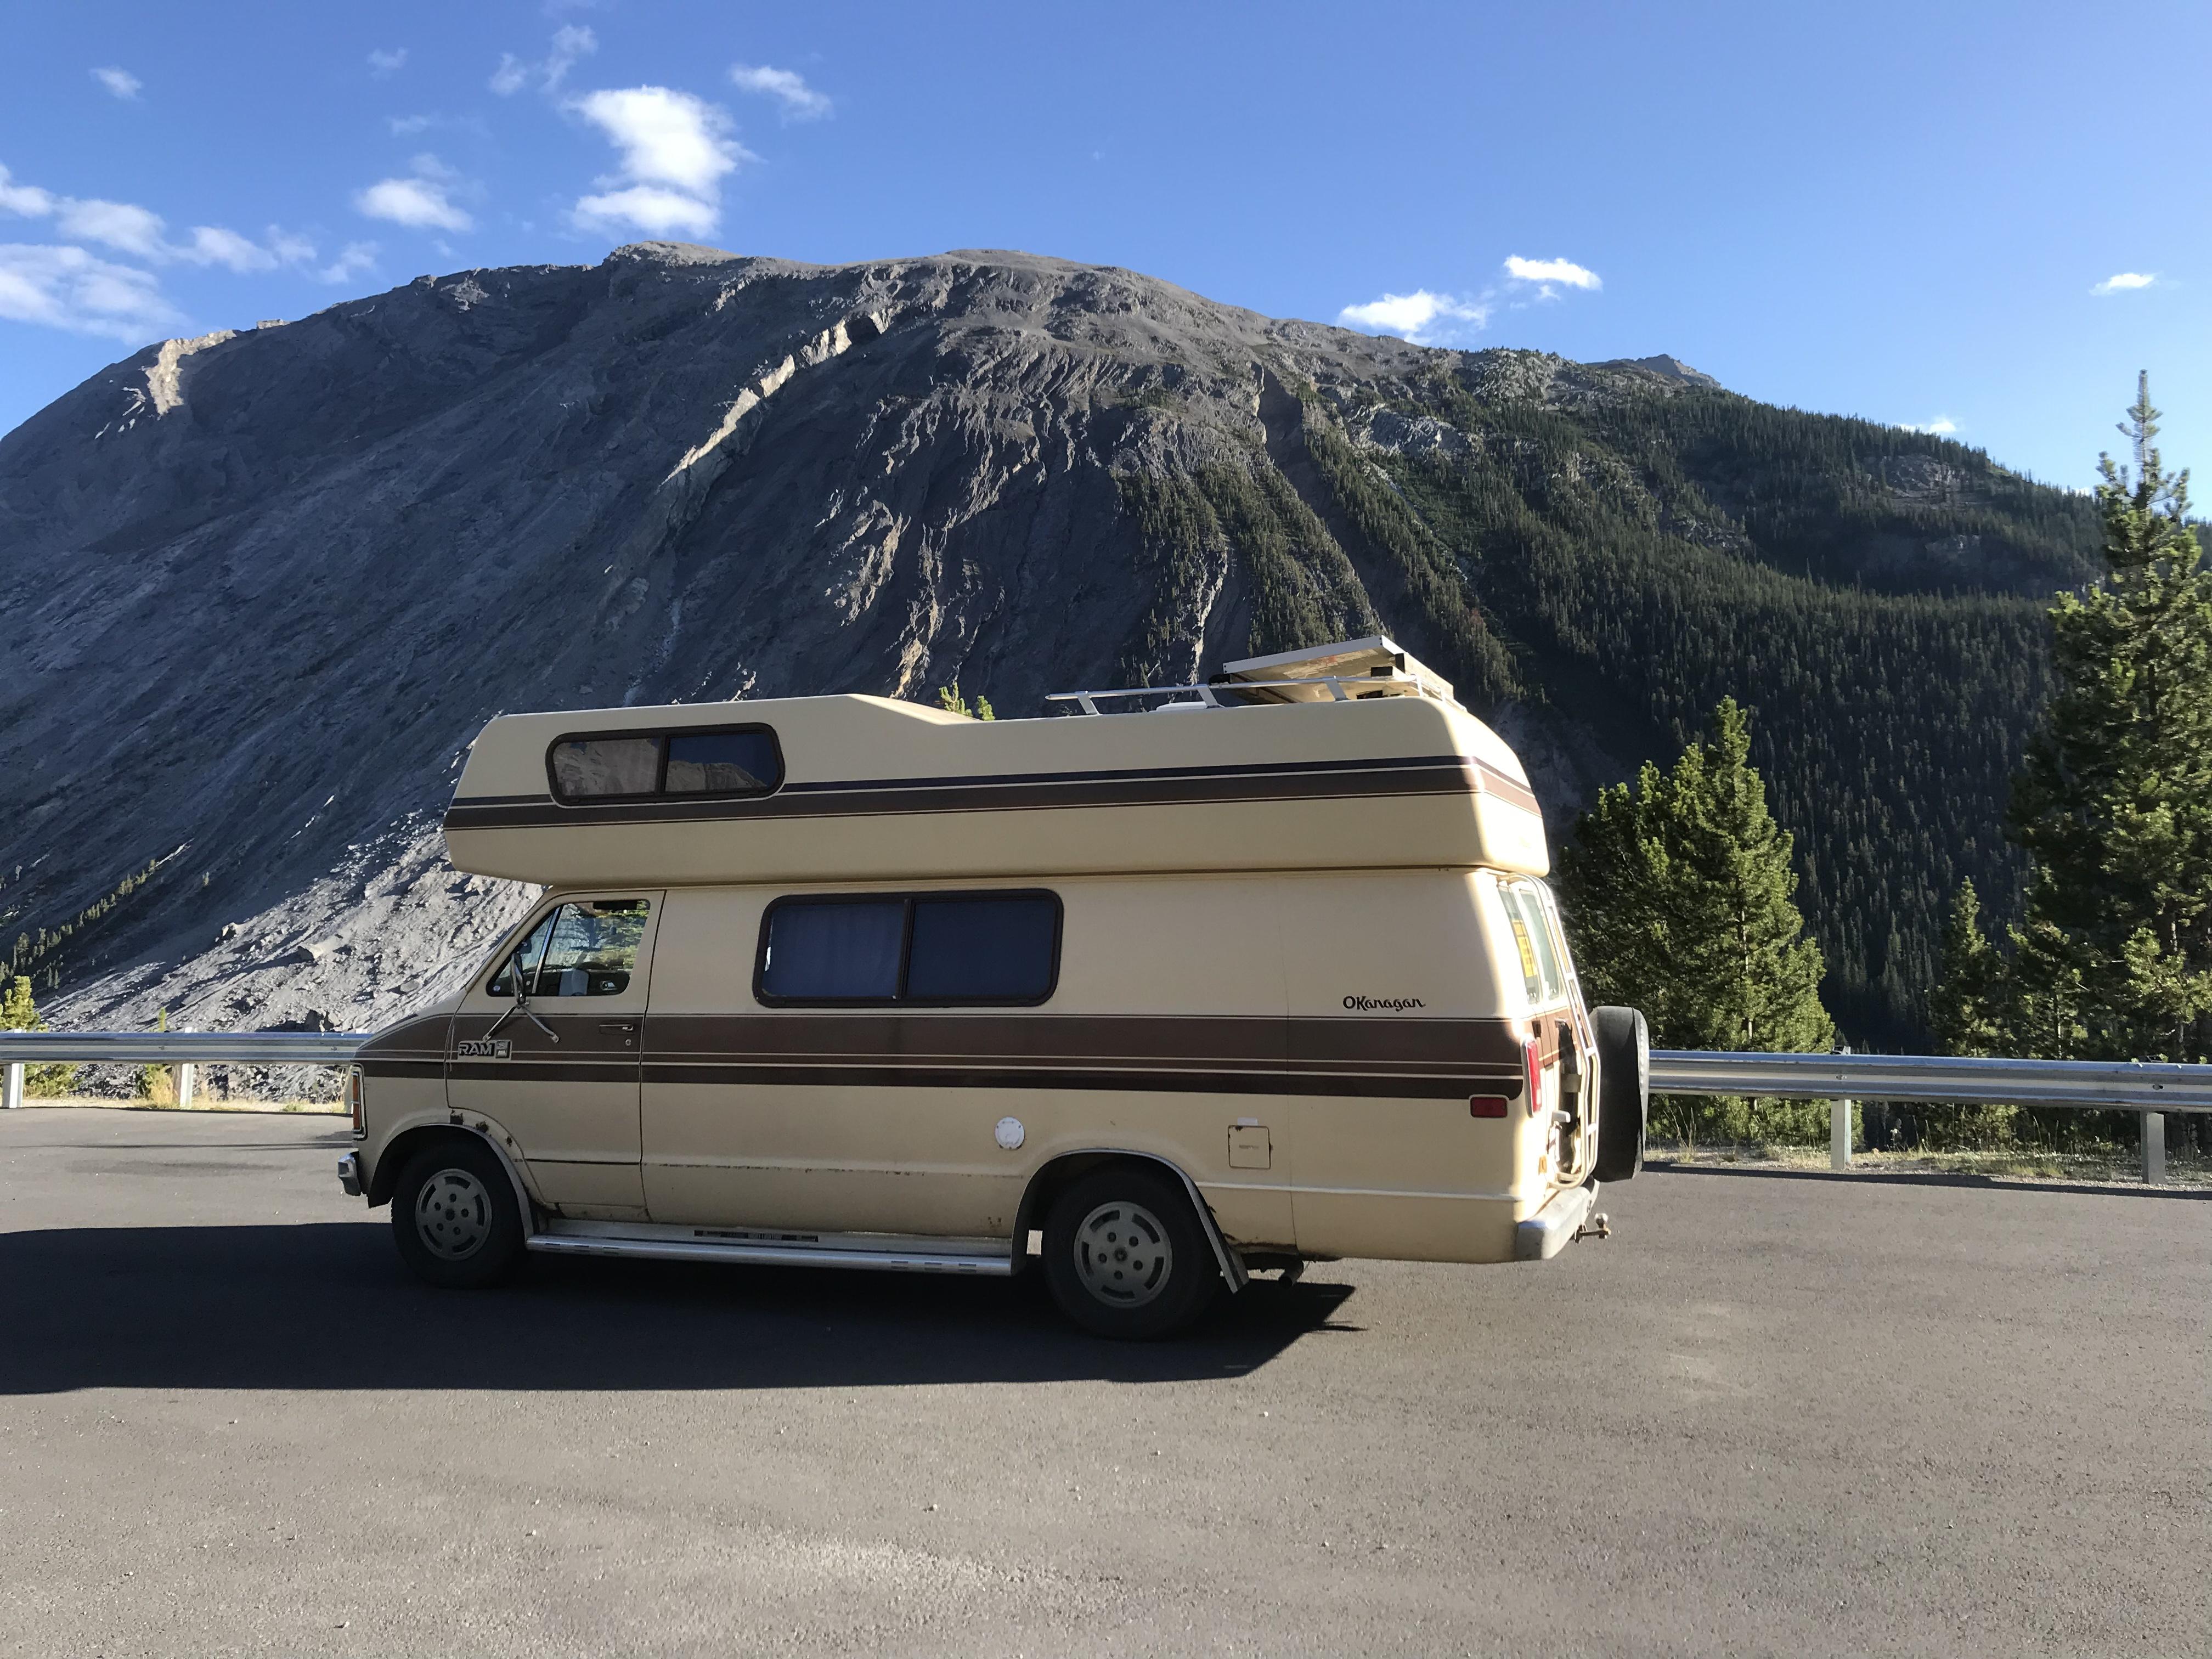 1984 Okanagan B250 Motor Home Camper Van Rental In Calgary Ab Outdoorsy